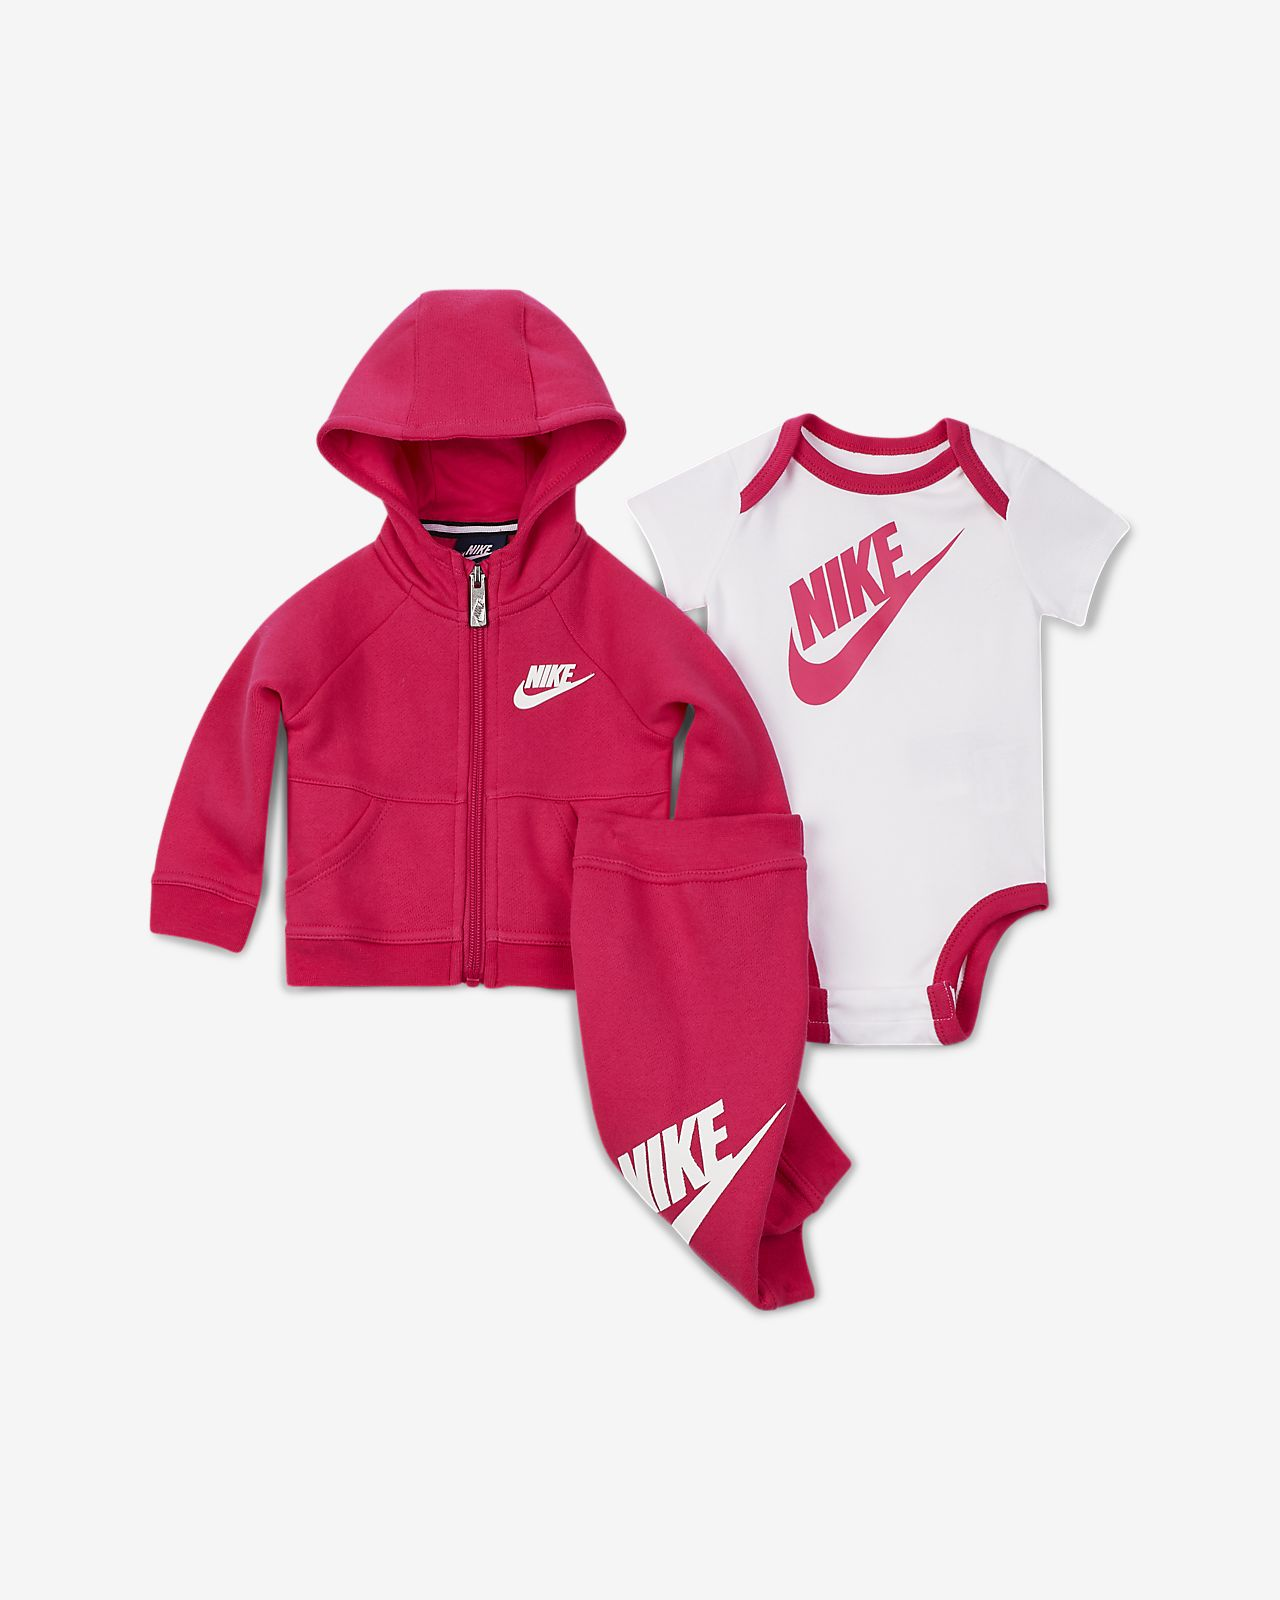 ece5d5bfdf Nike Futura Three-Piece Infant Boxed Set. Nike.com